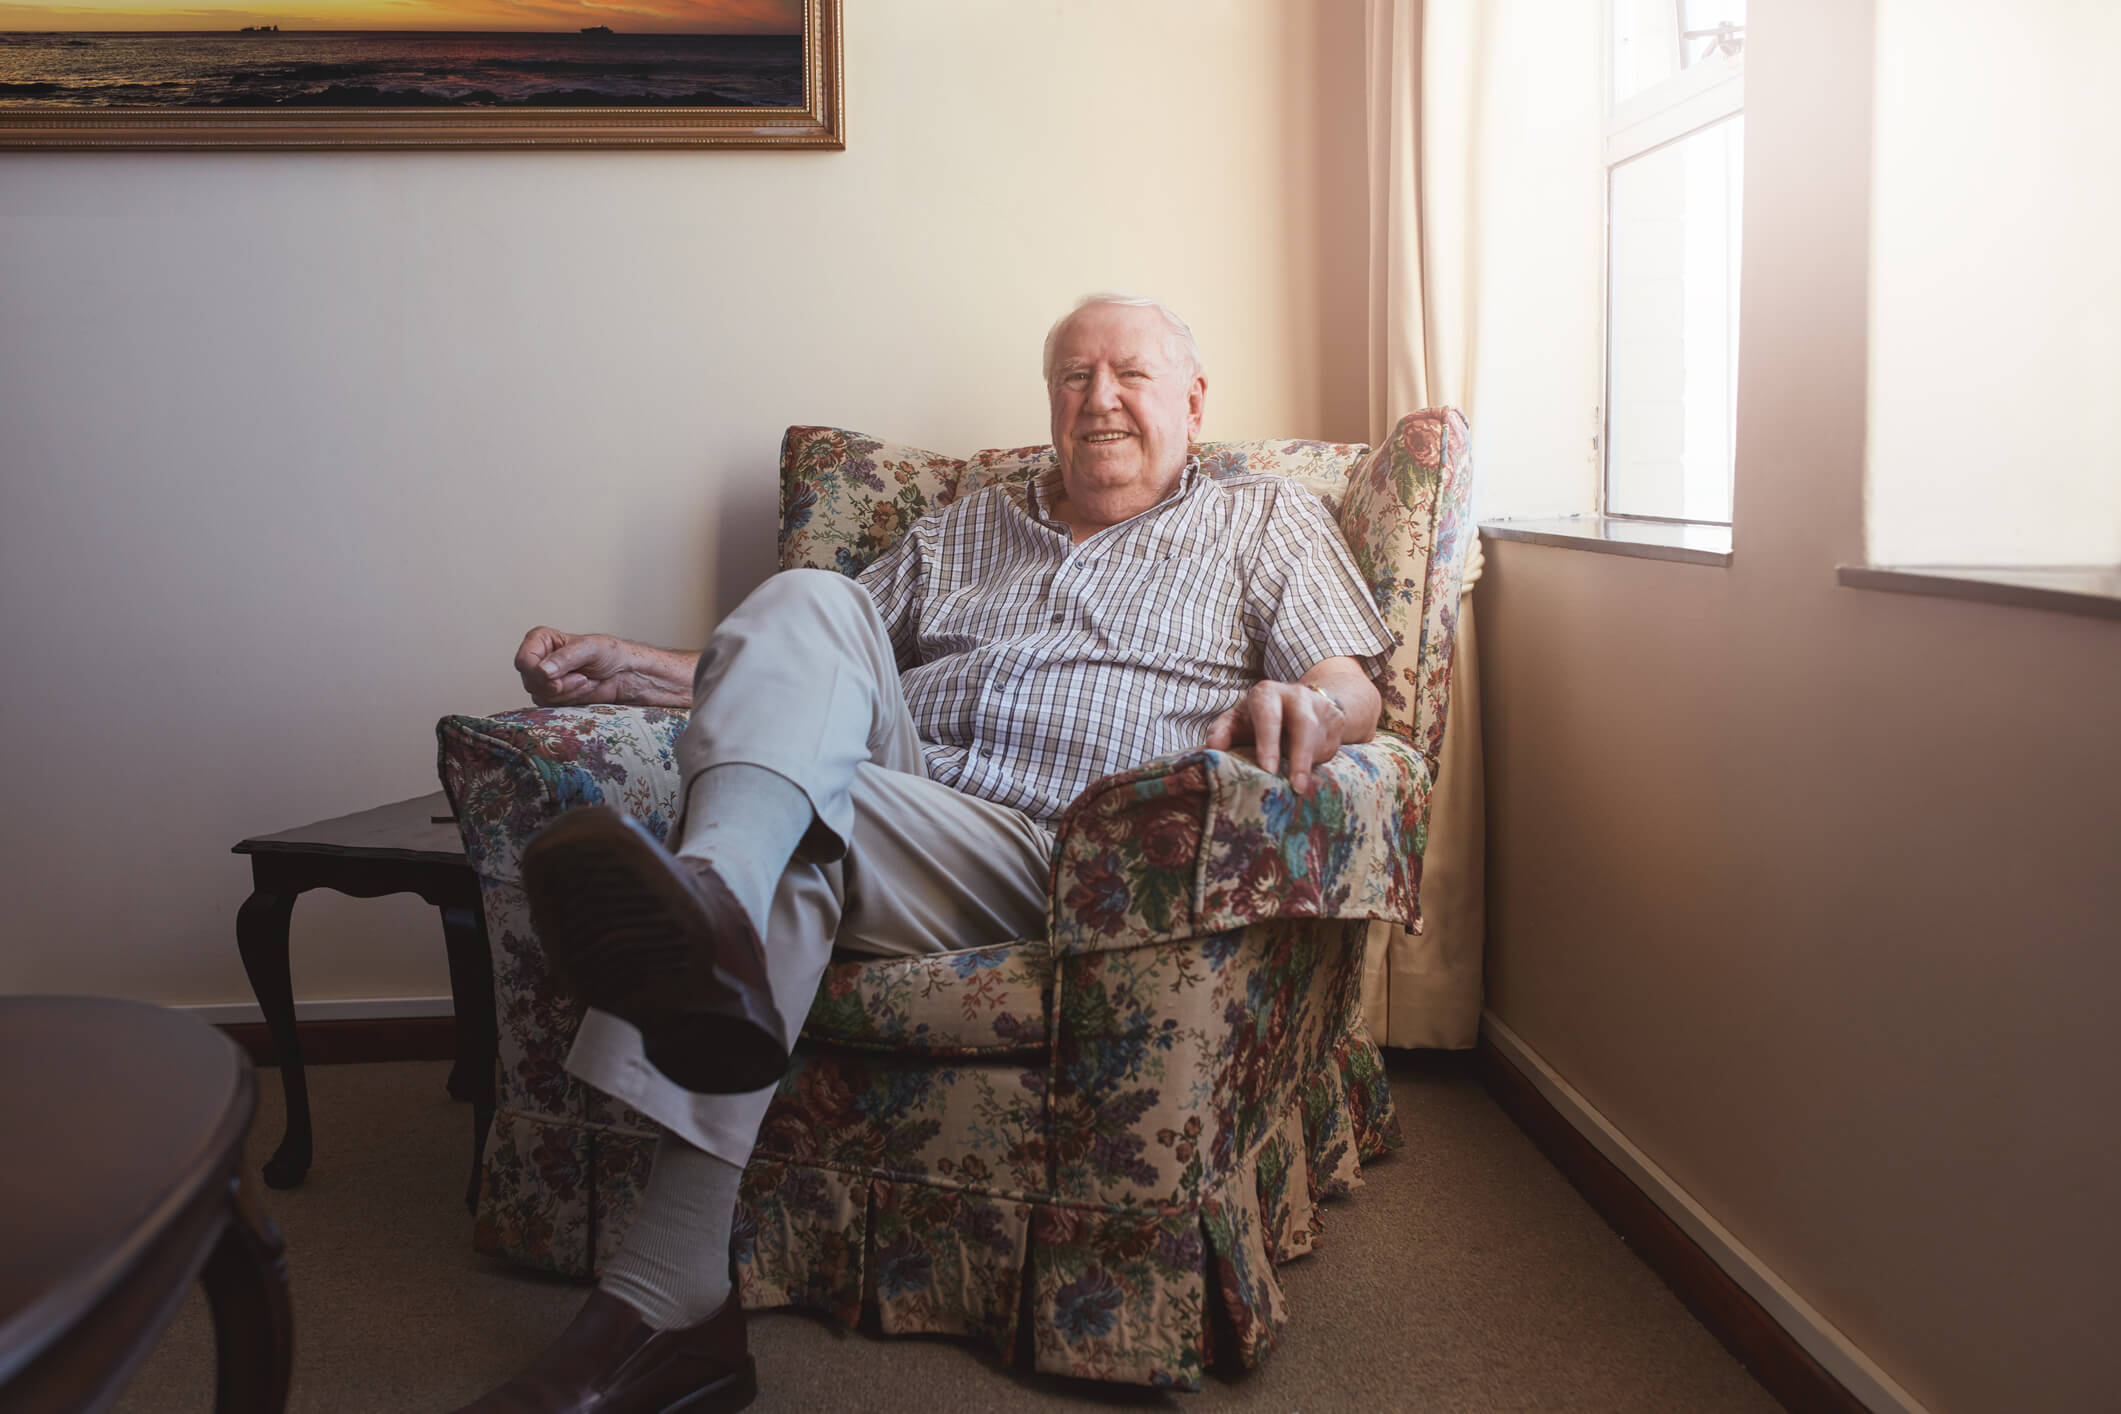 A Senior Gentleman in a Love Seat